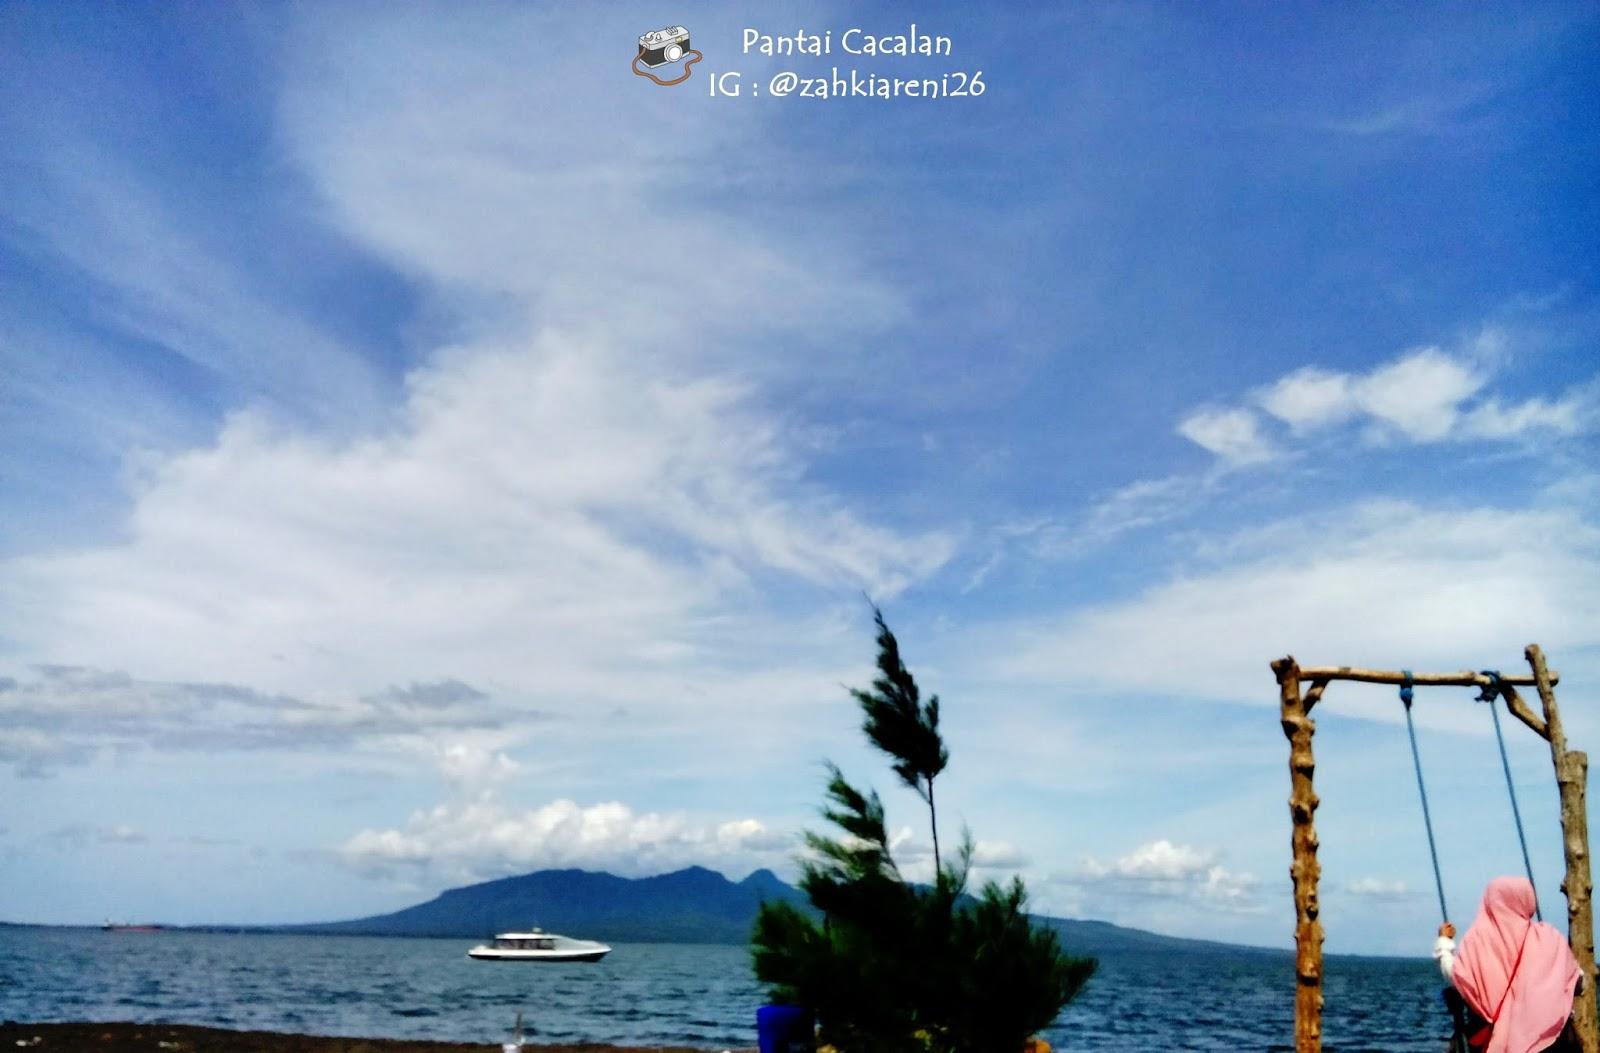 Pantai Cacalan Banyuwangi Semilir Angin Selat Bali Asli Suka Banget